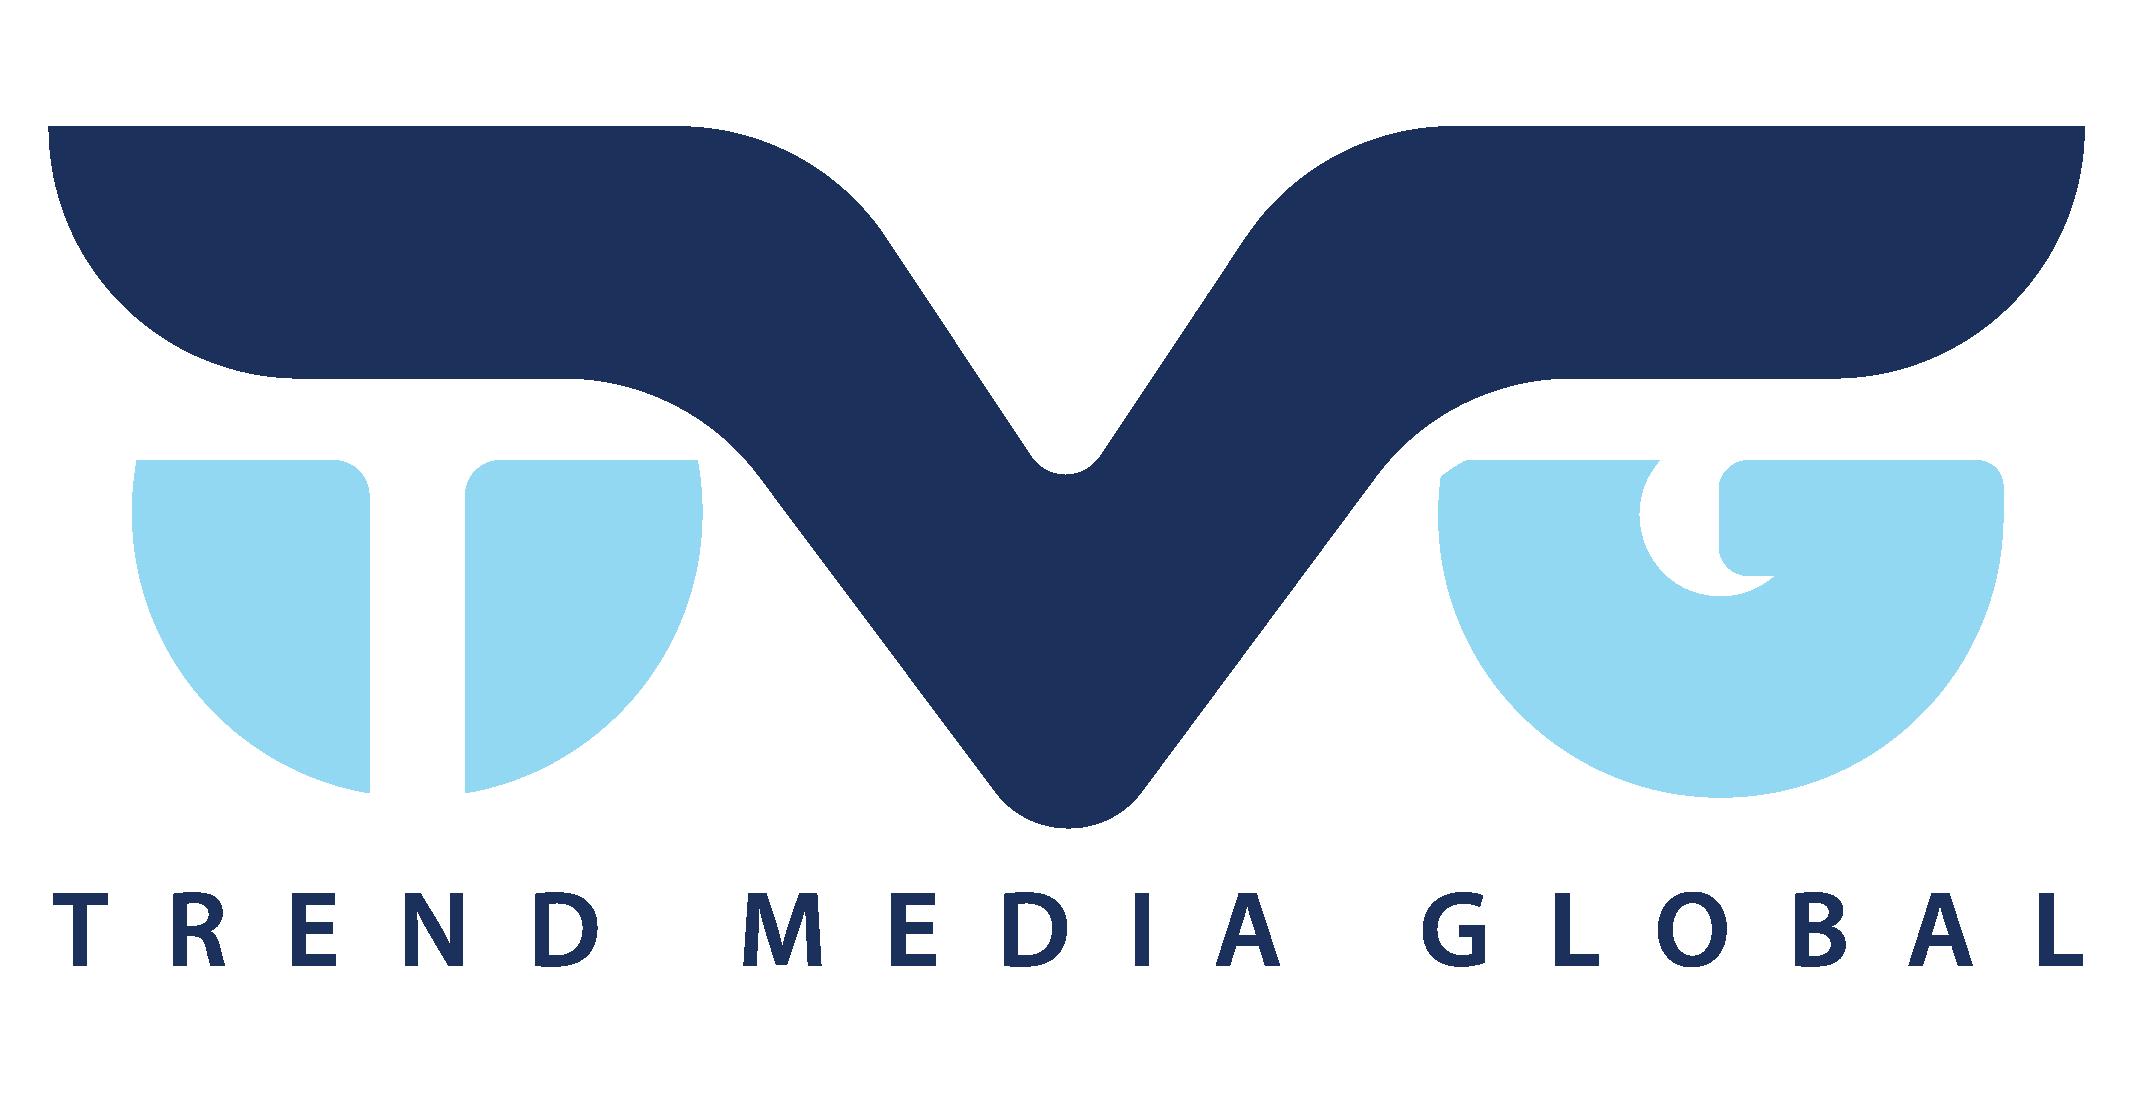 Trend Media Global